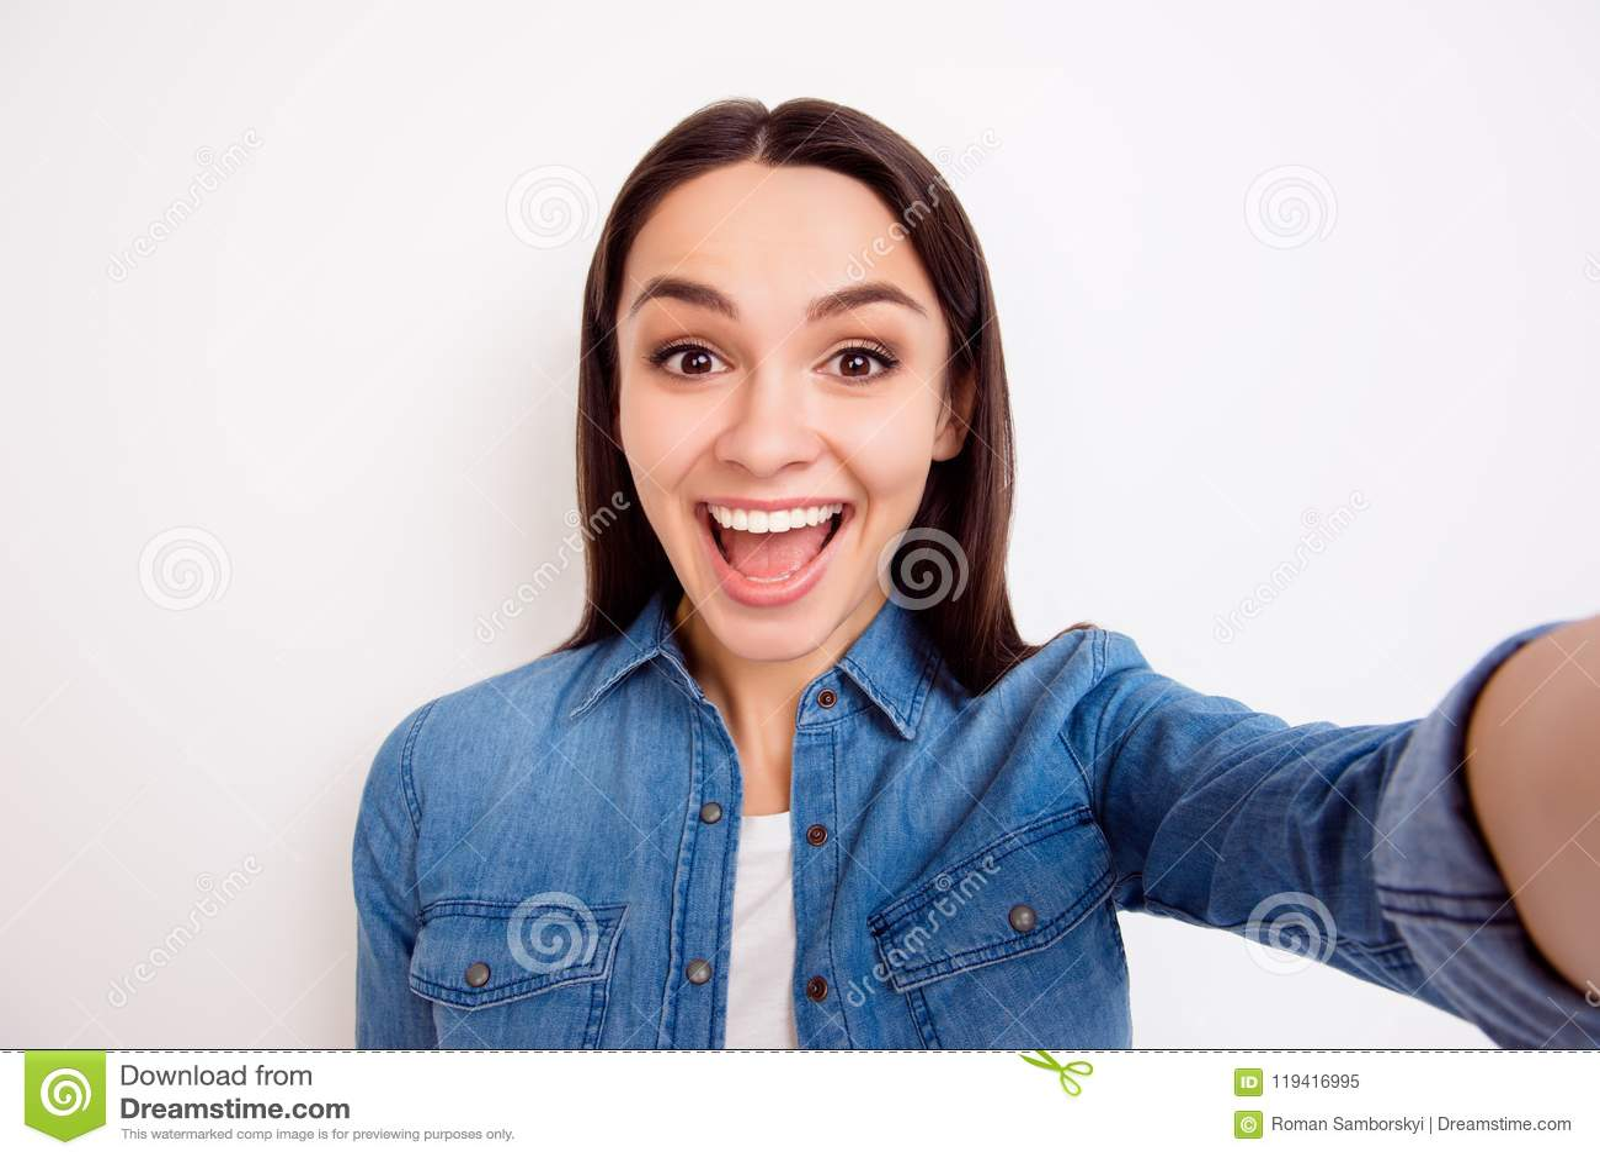 Jong vrij vrolijk meisje in jeansoverhemd die zelf-portret nemen